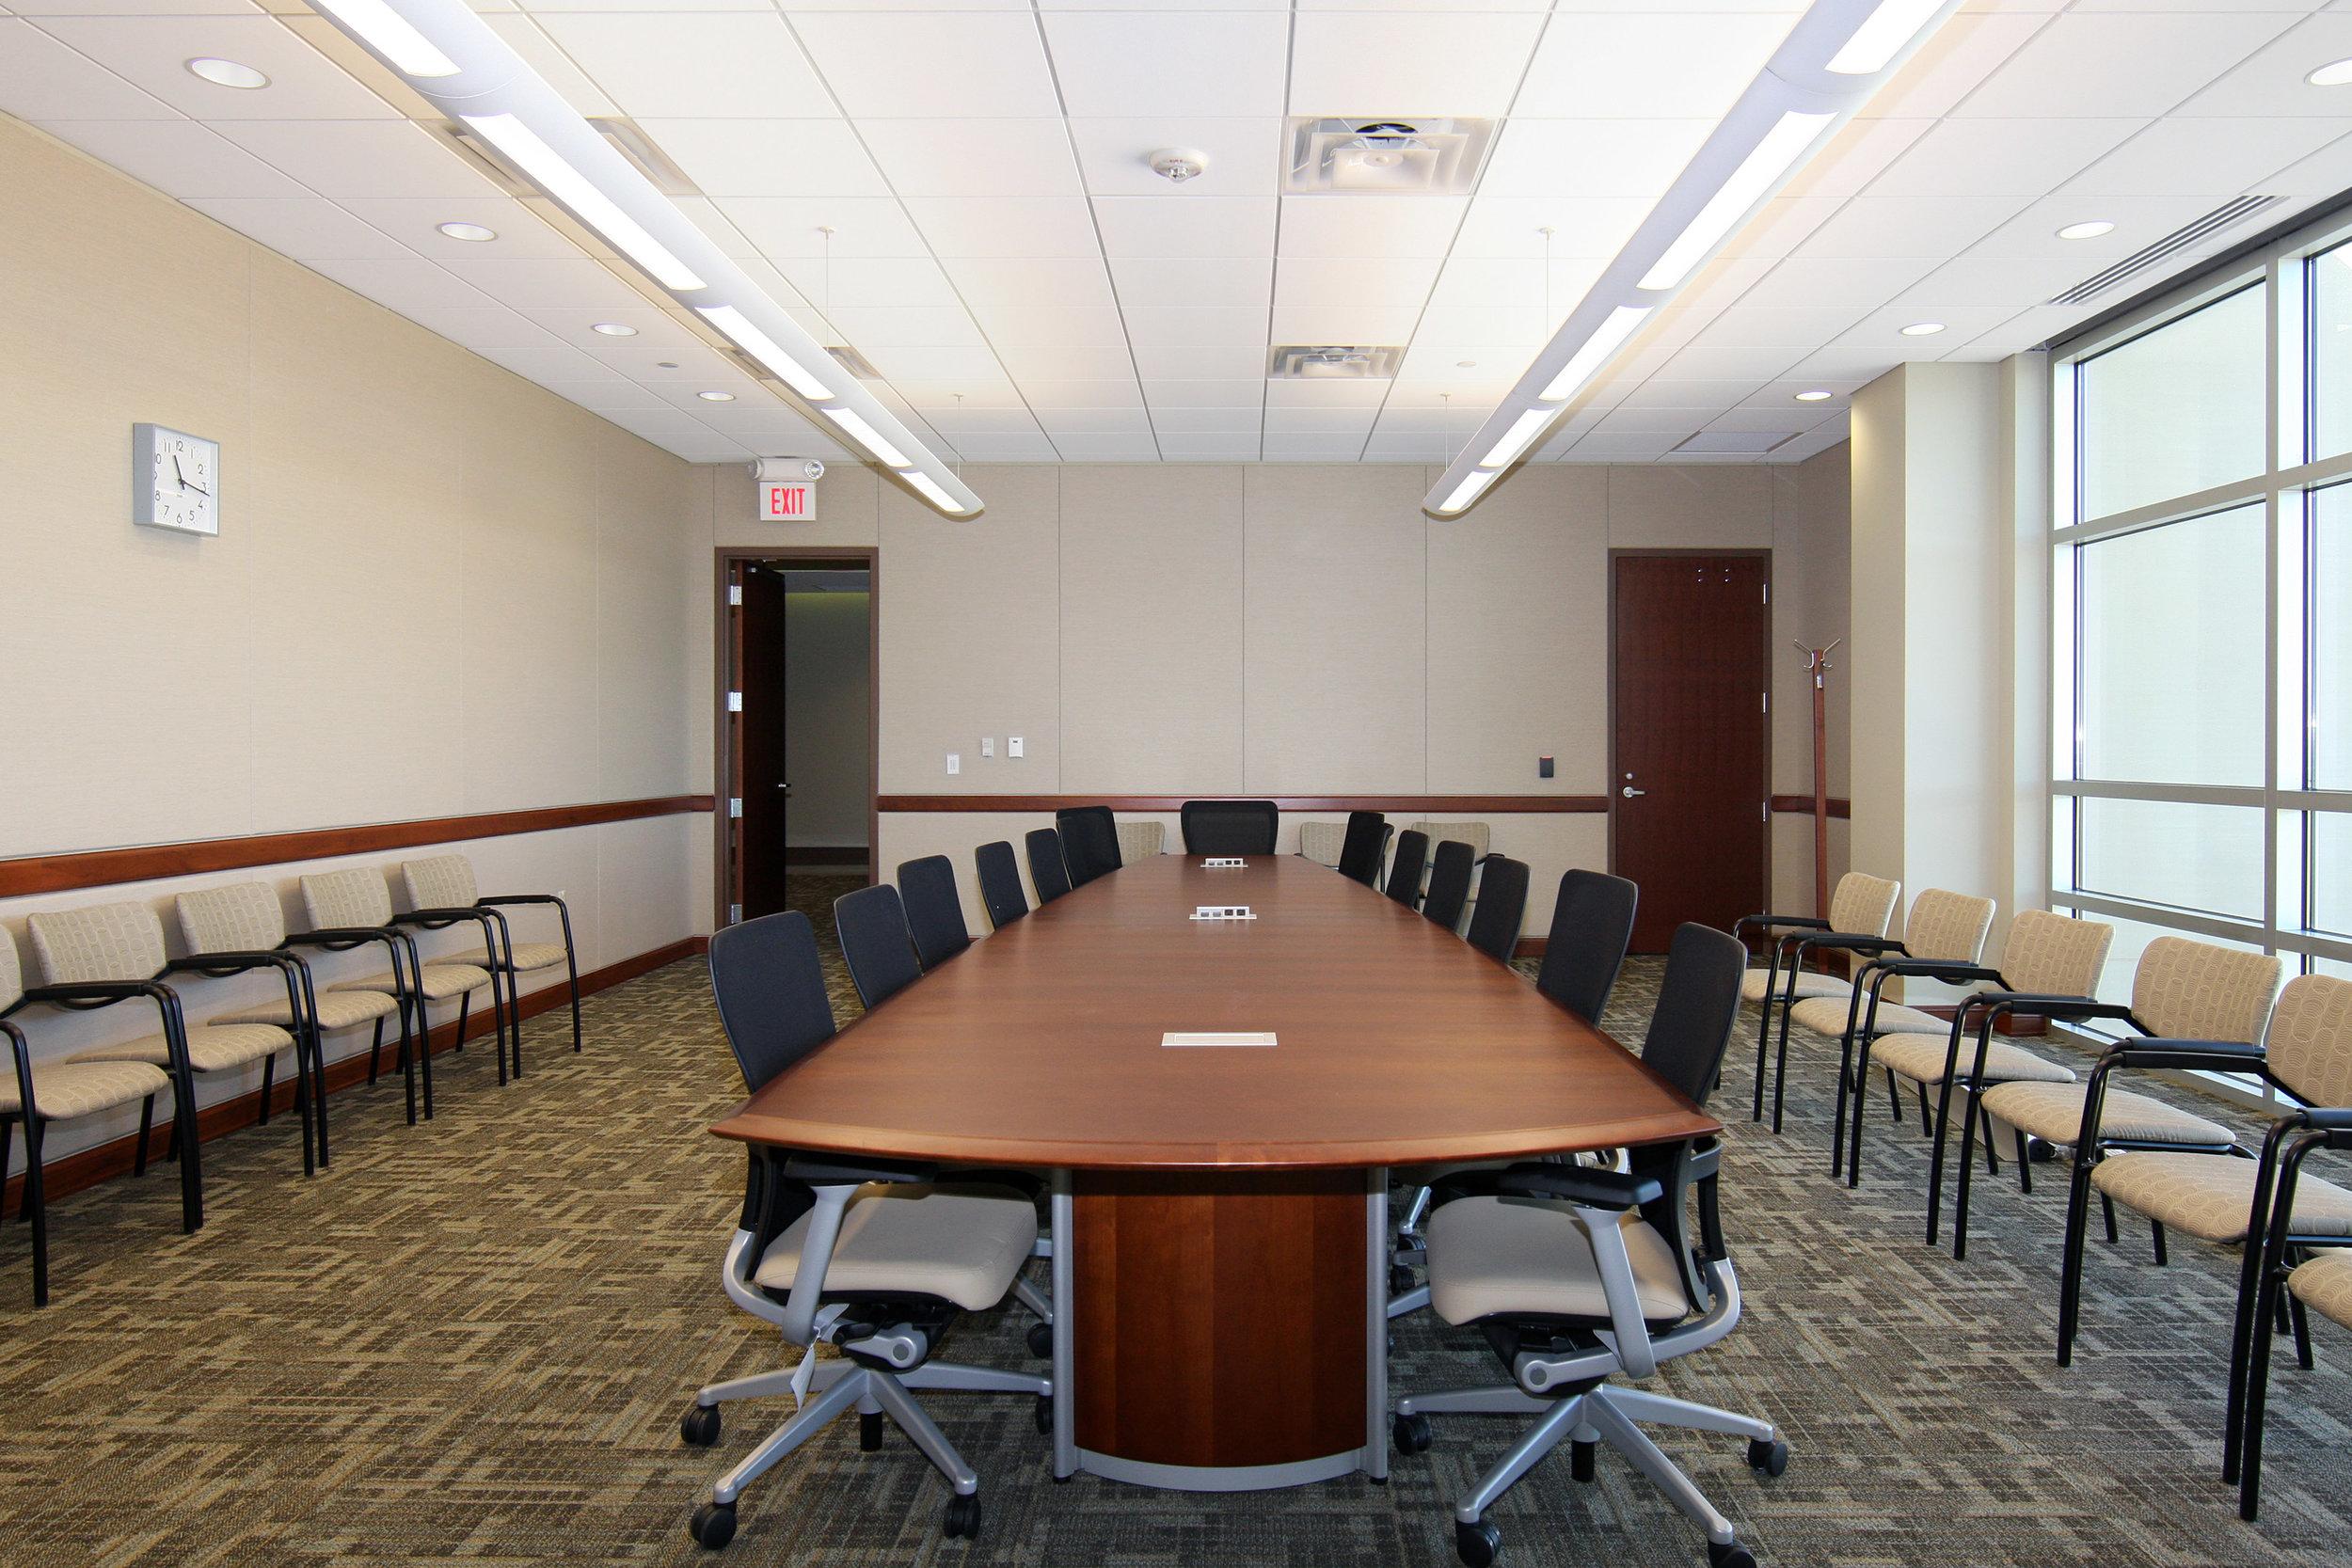 OSF_boardroom_01.jpg